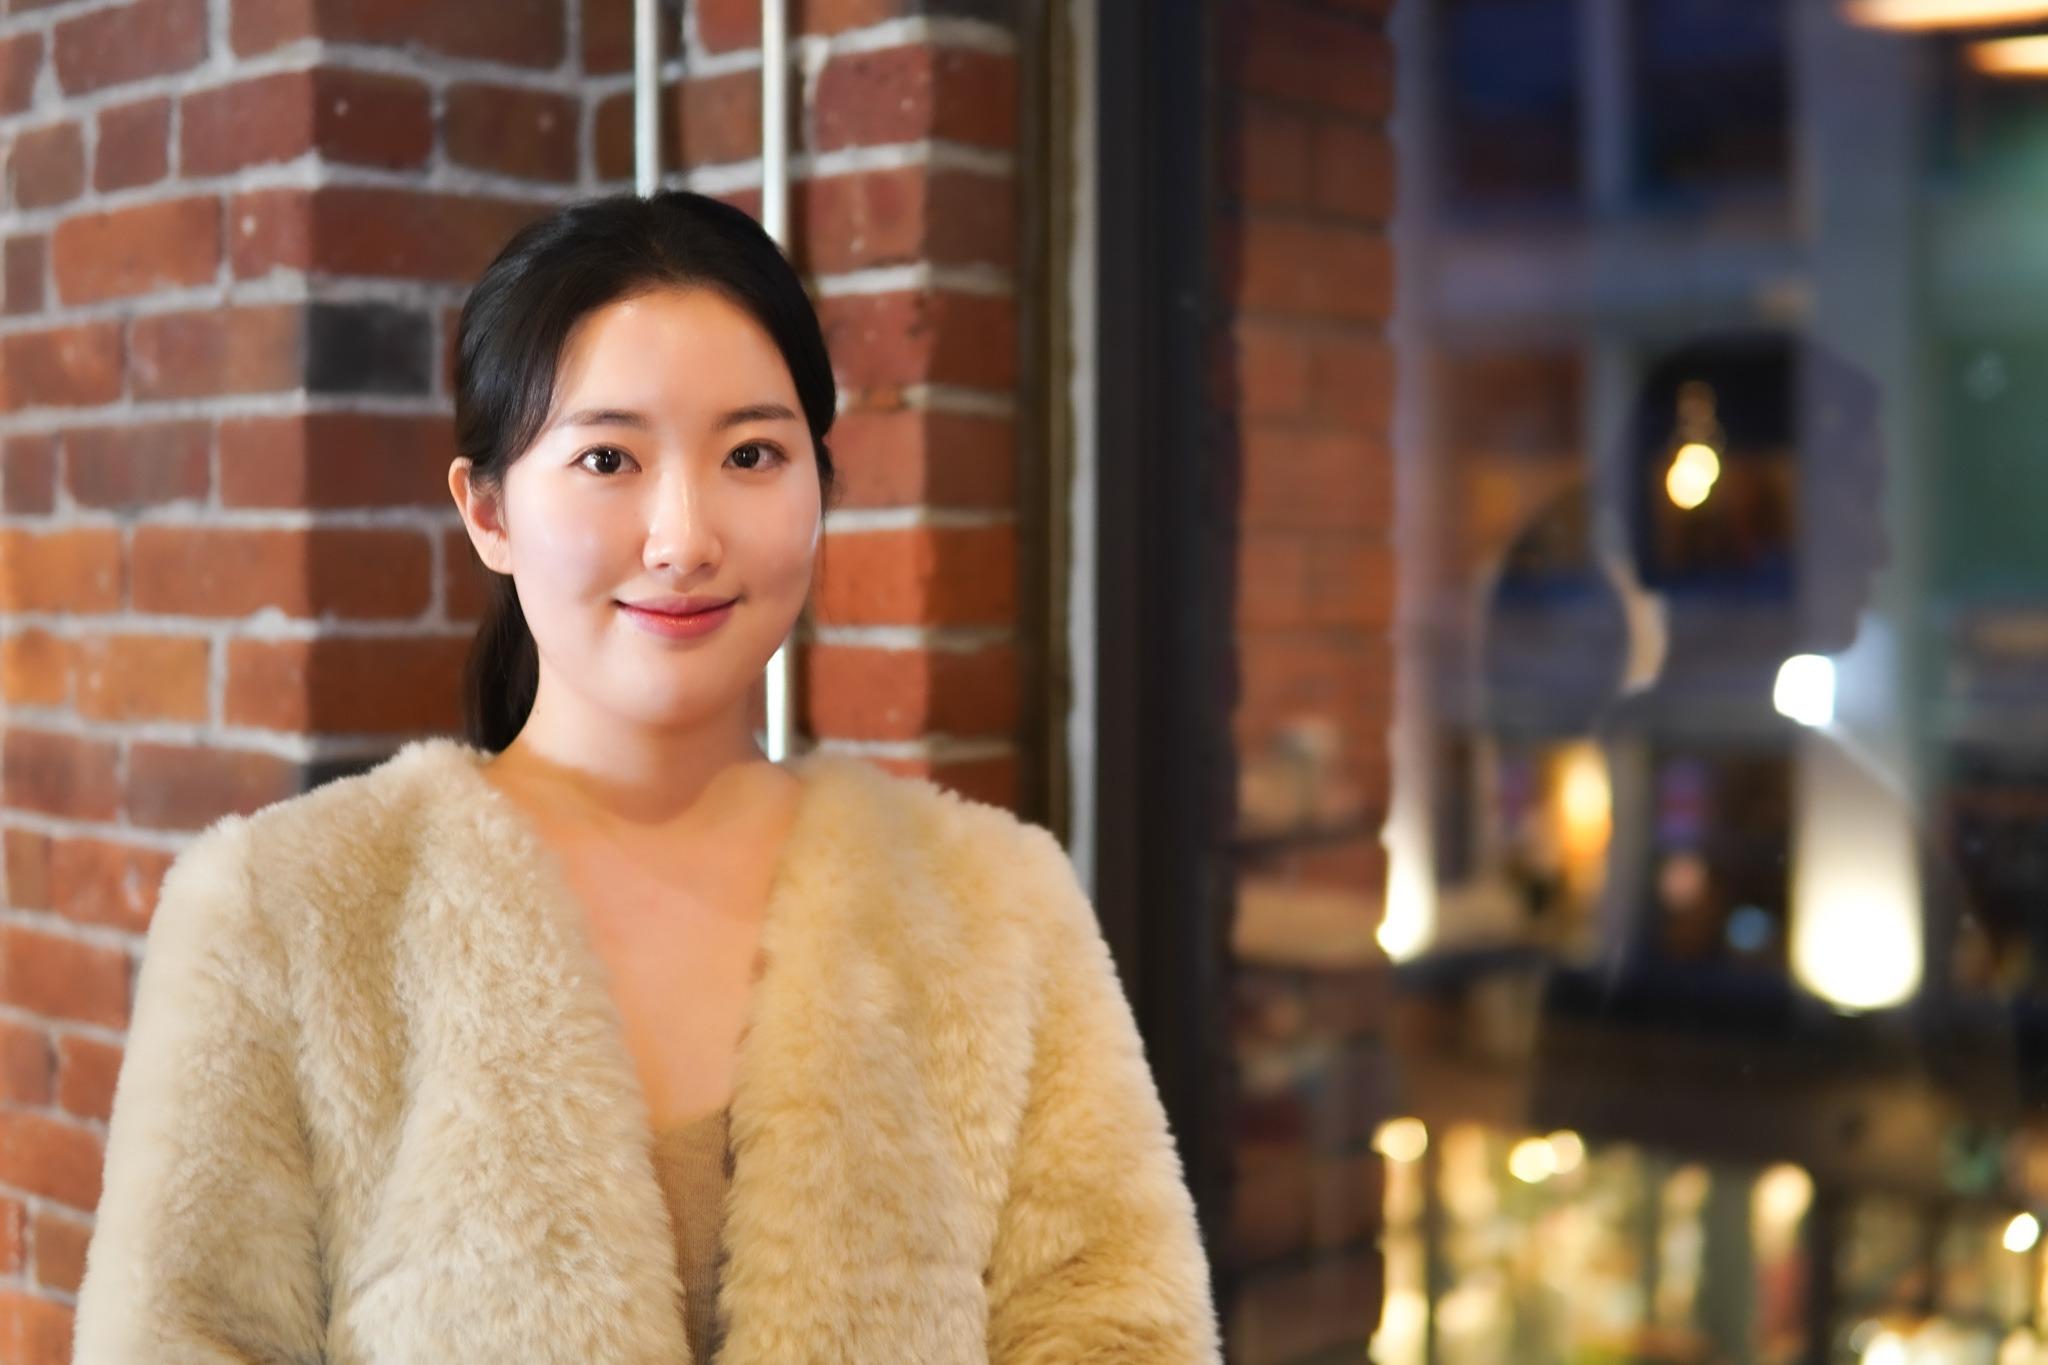 Insung / Business Foundations 200 - Nationality: South Korea